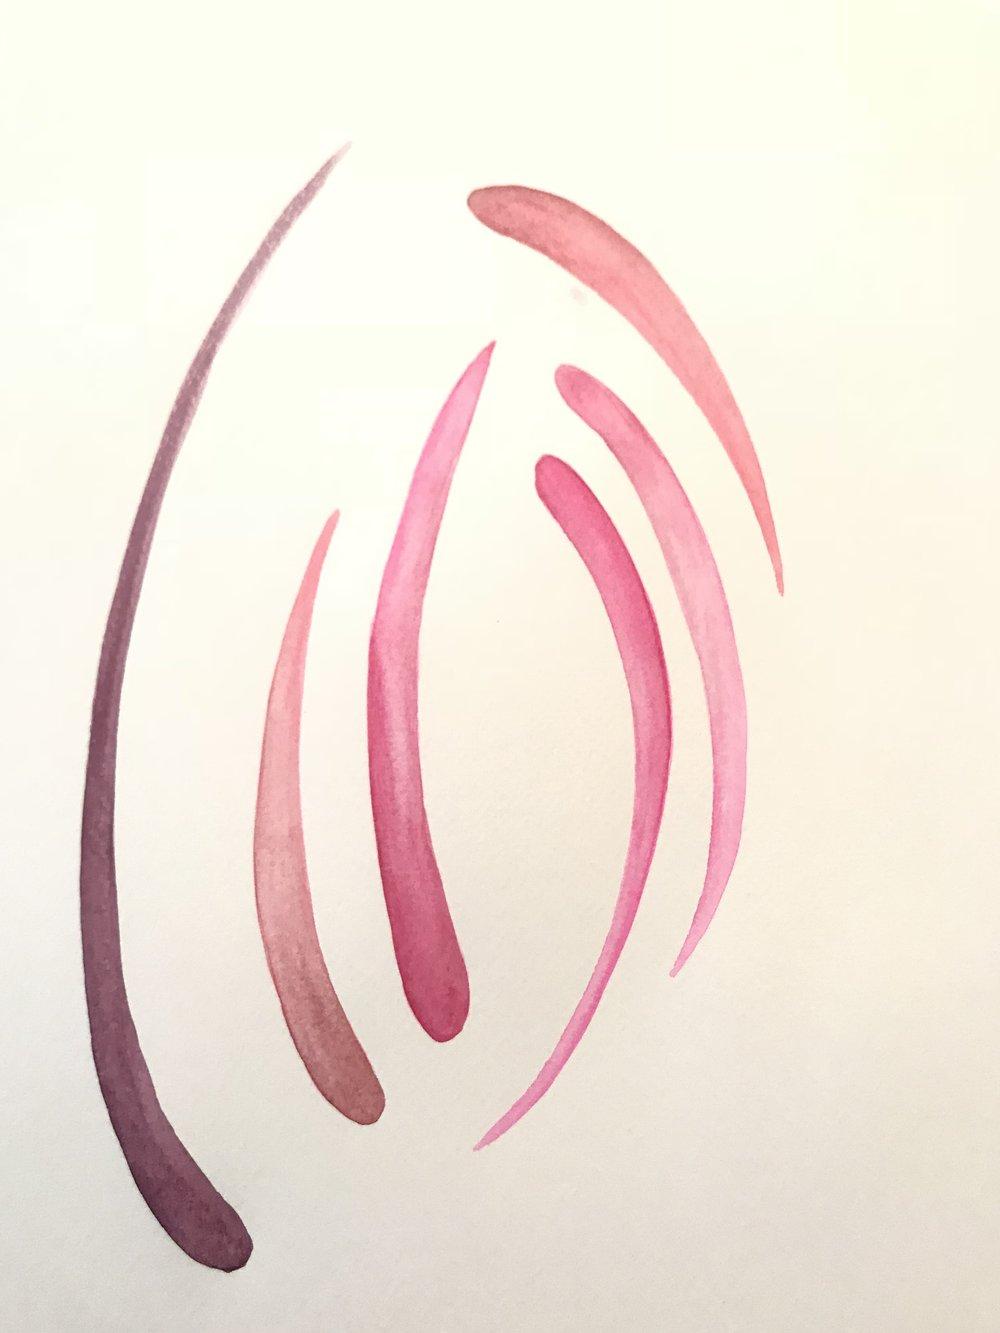 watercolor swipes